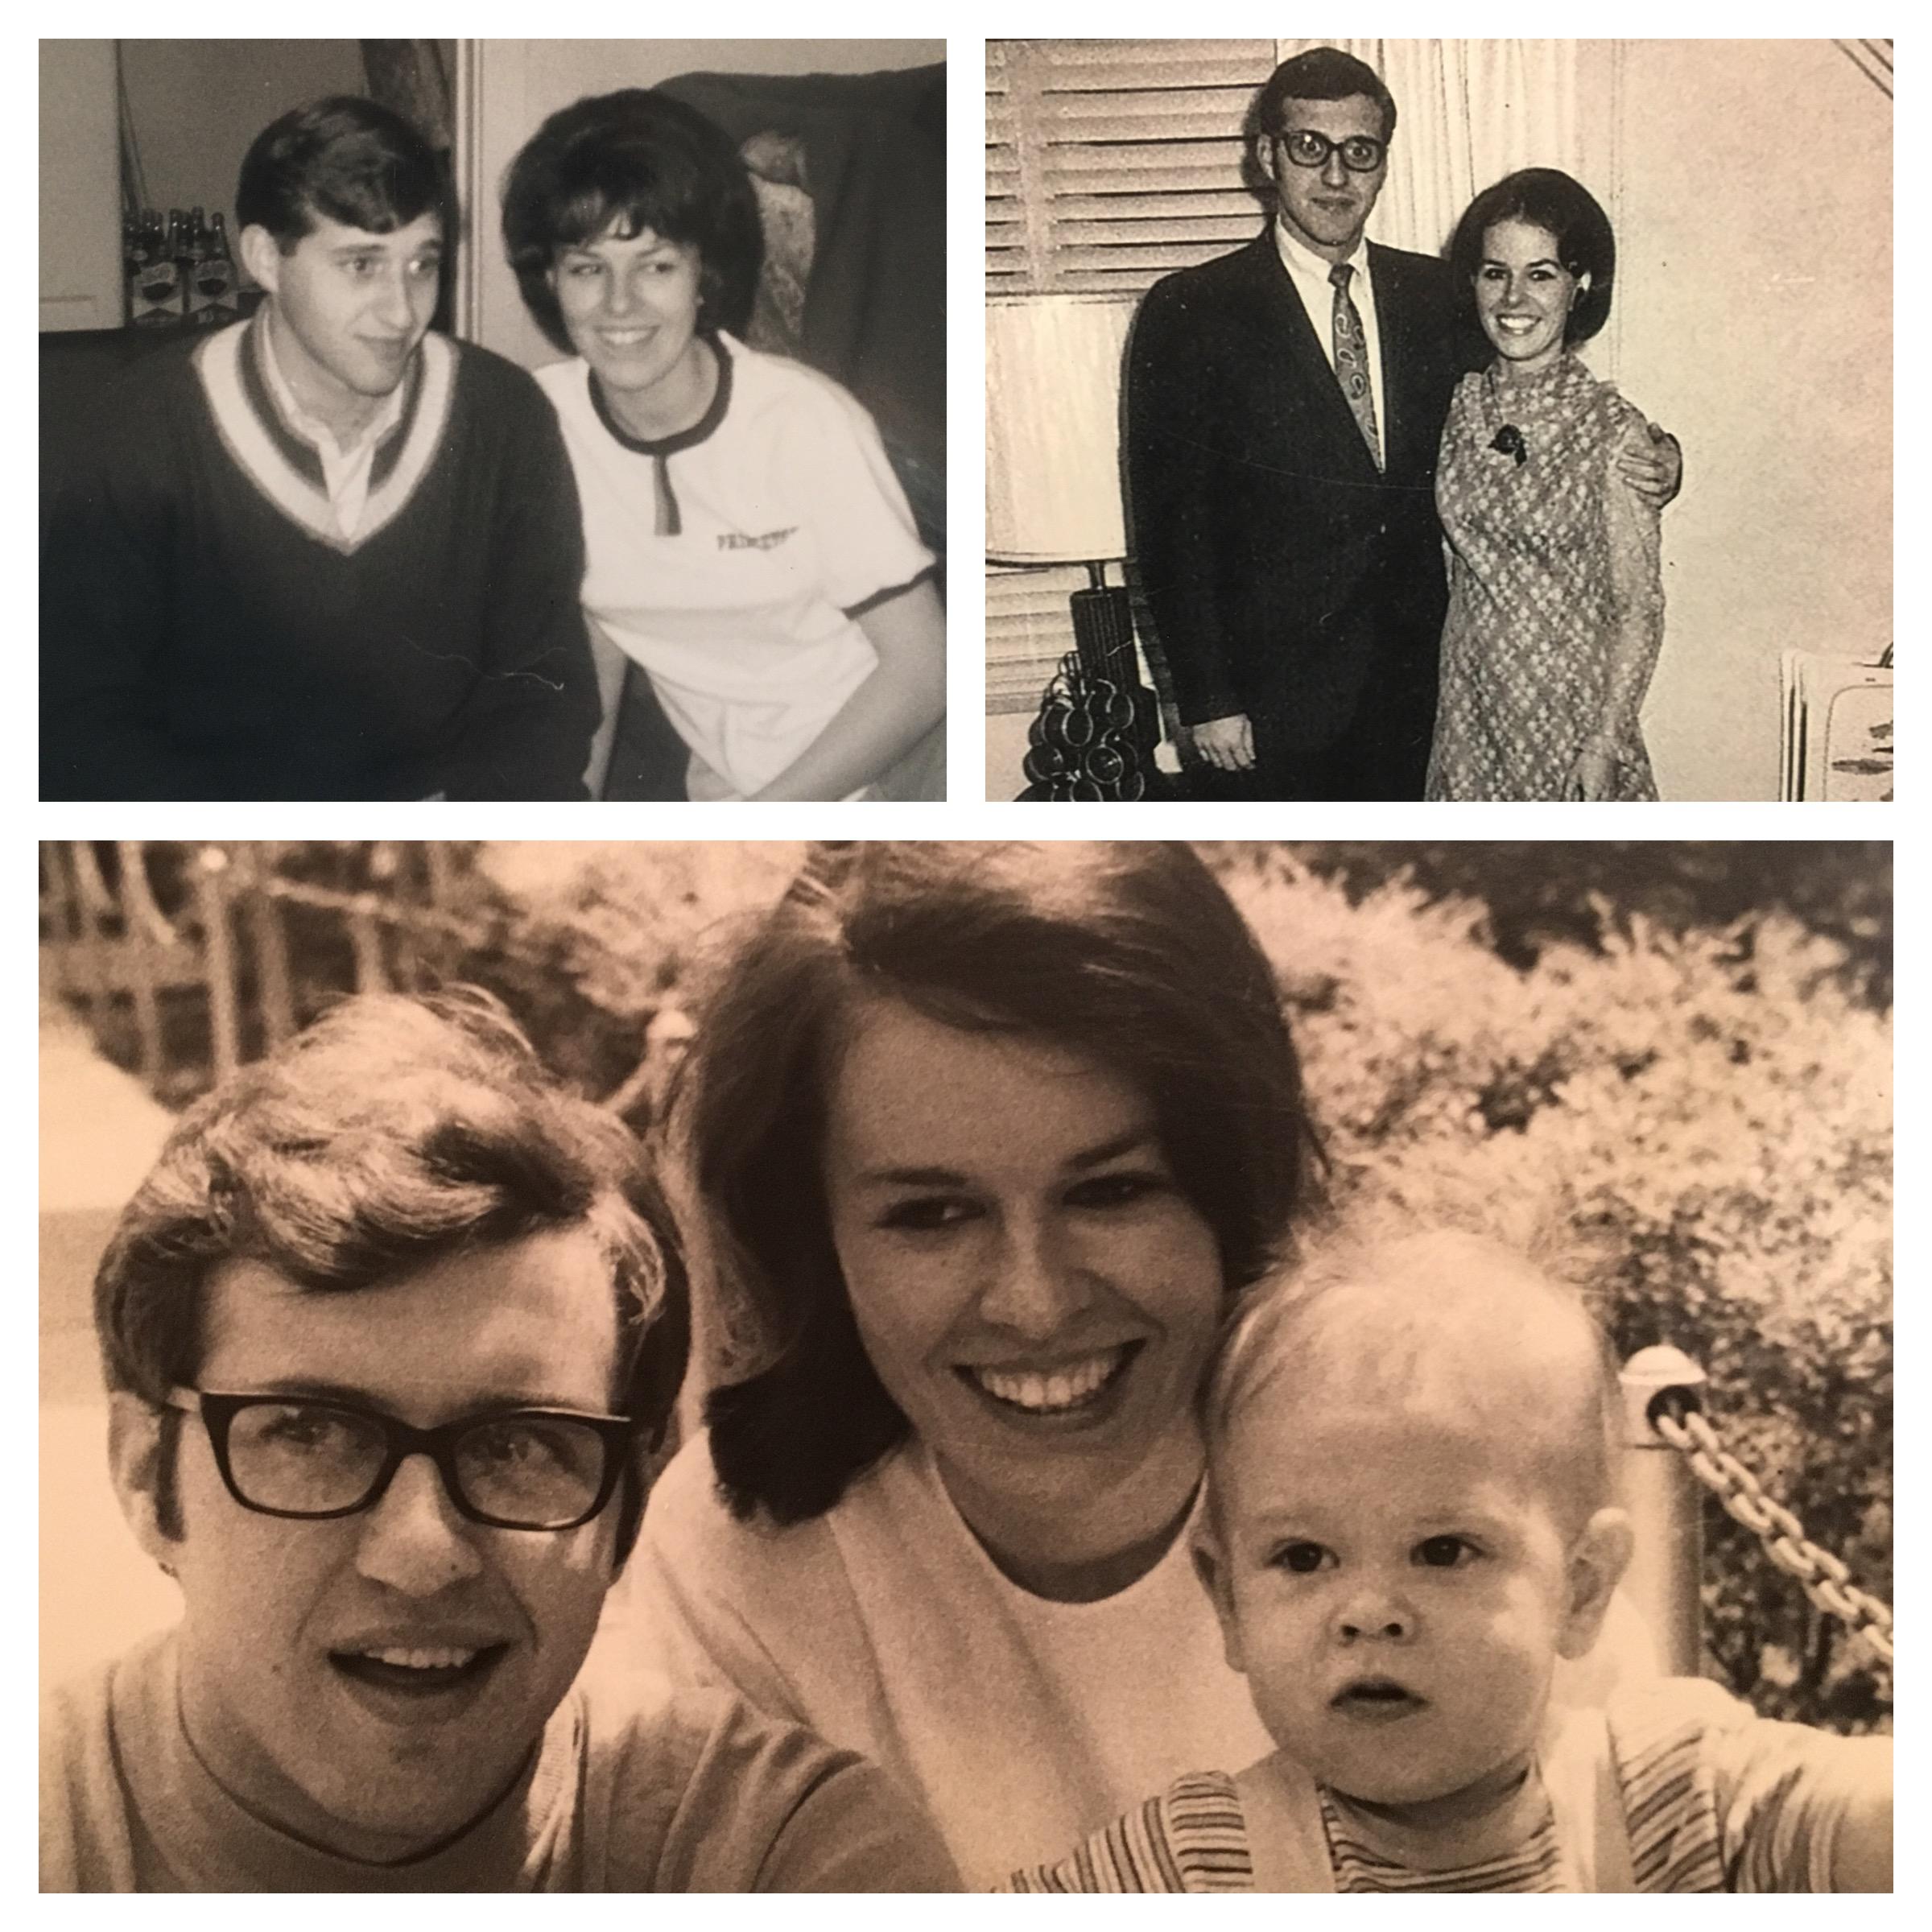 1) My mom and dad; 2)my mom and dad; 3)my mom and dad and me.